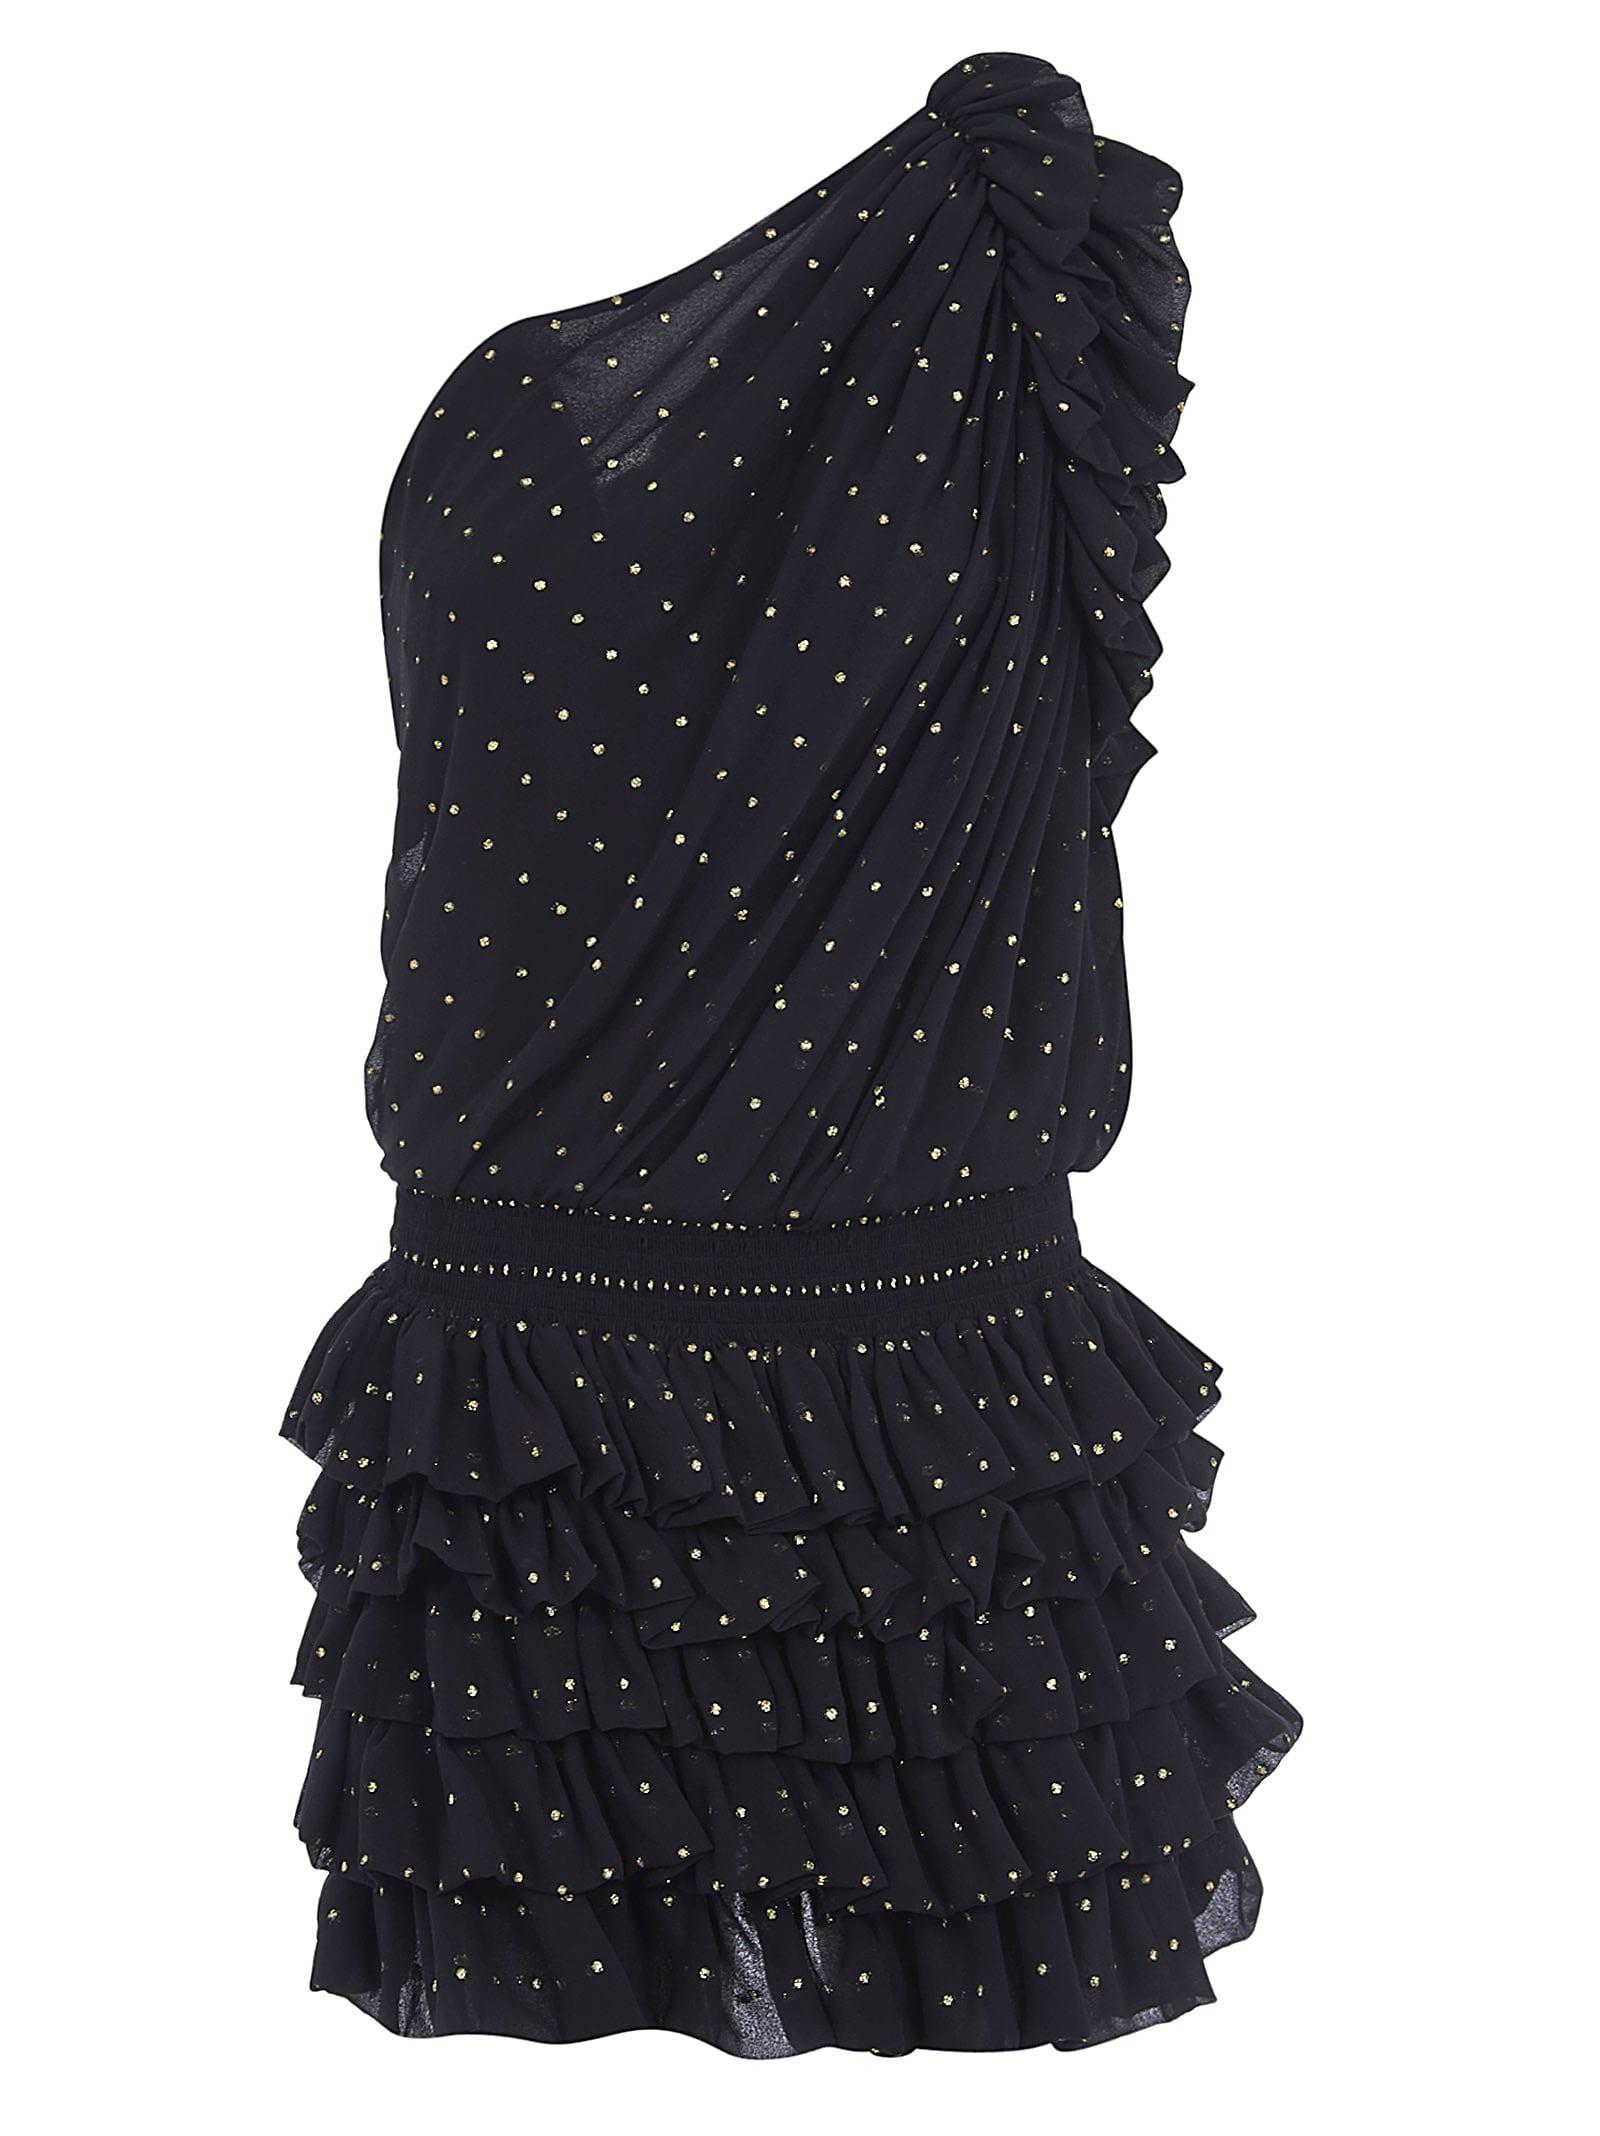 Buy Saint Laurent One-sleeve Embellished Dress online, shop Saint Laurent with free shipping